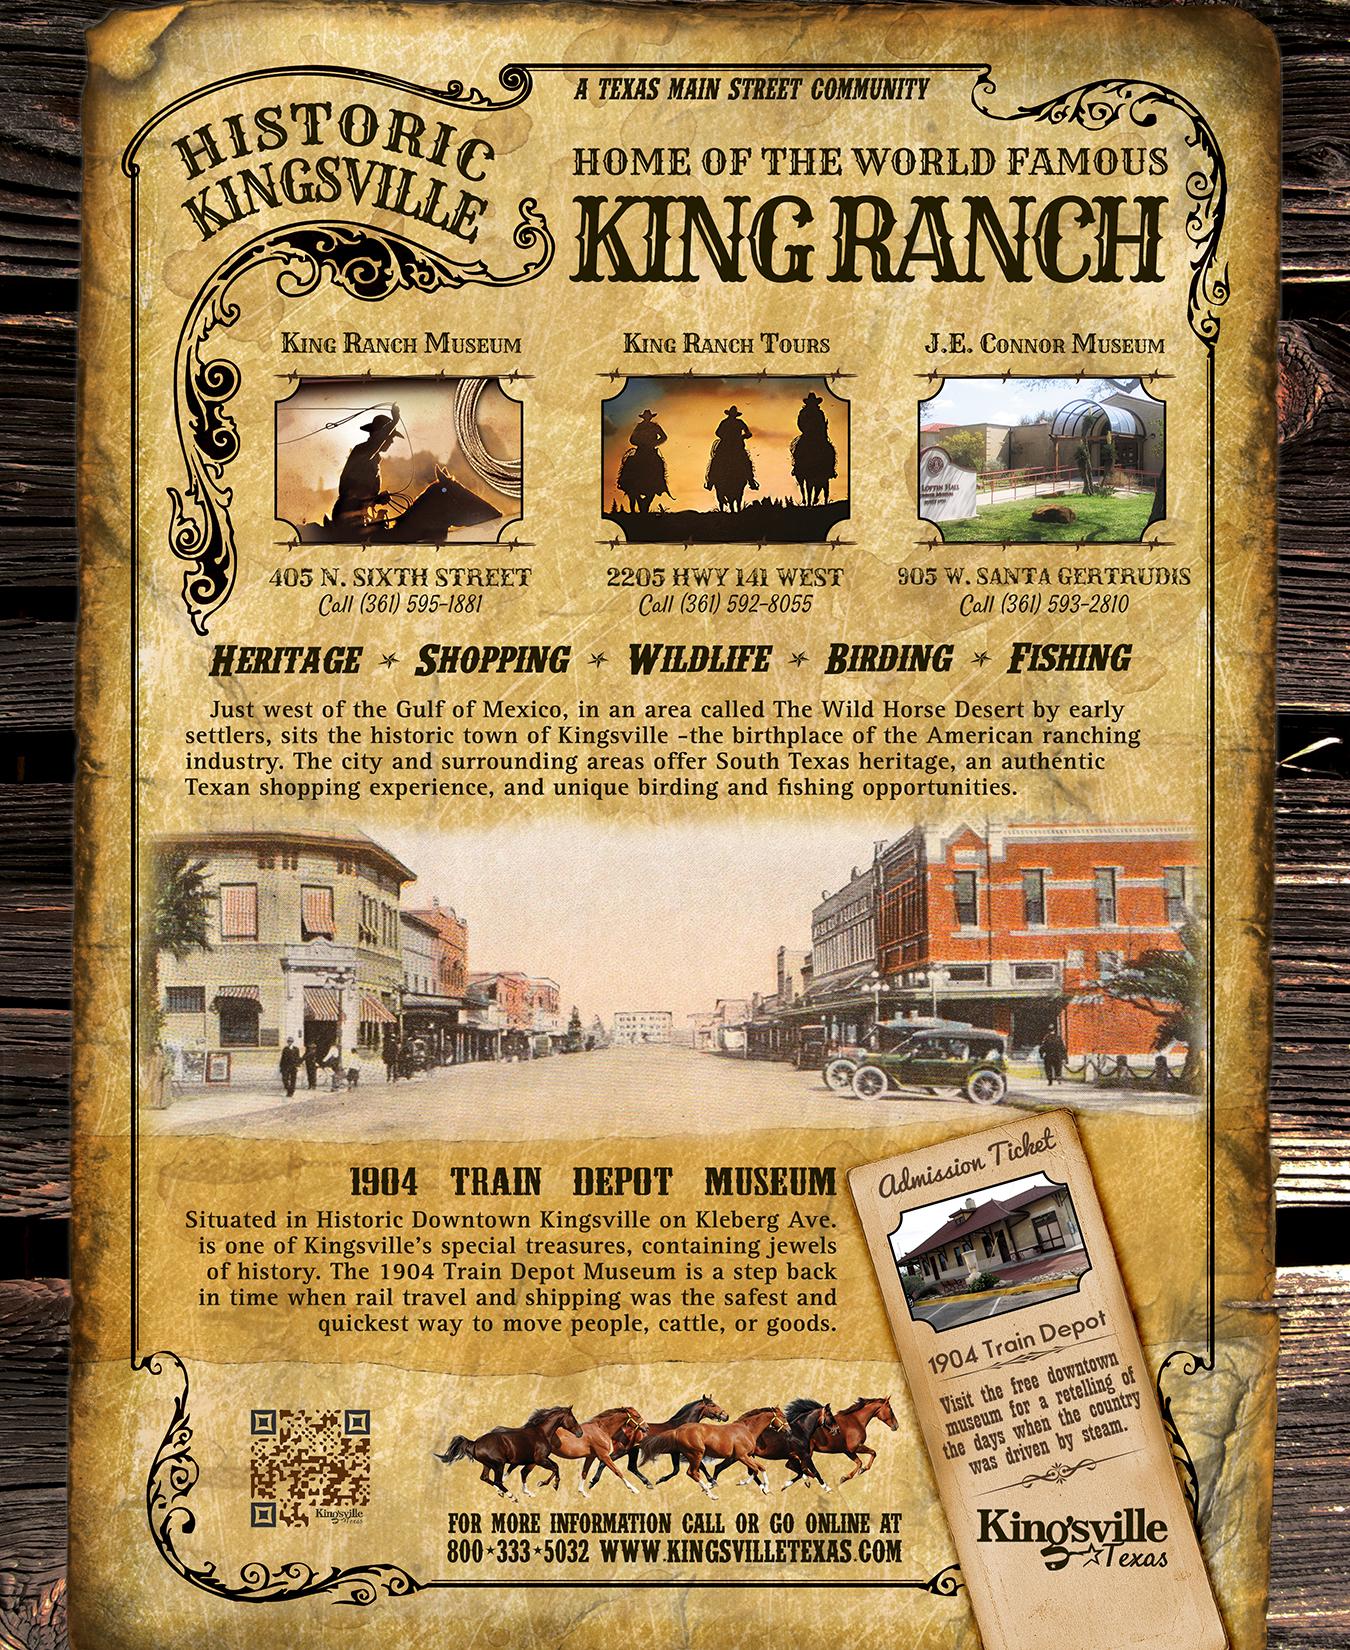 King Ranch Texas >> Kingsville, Texas Tourism